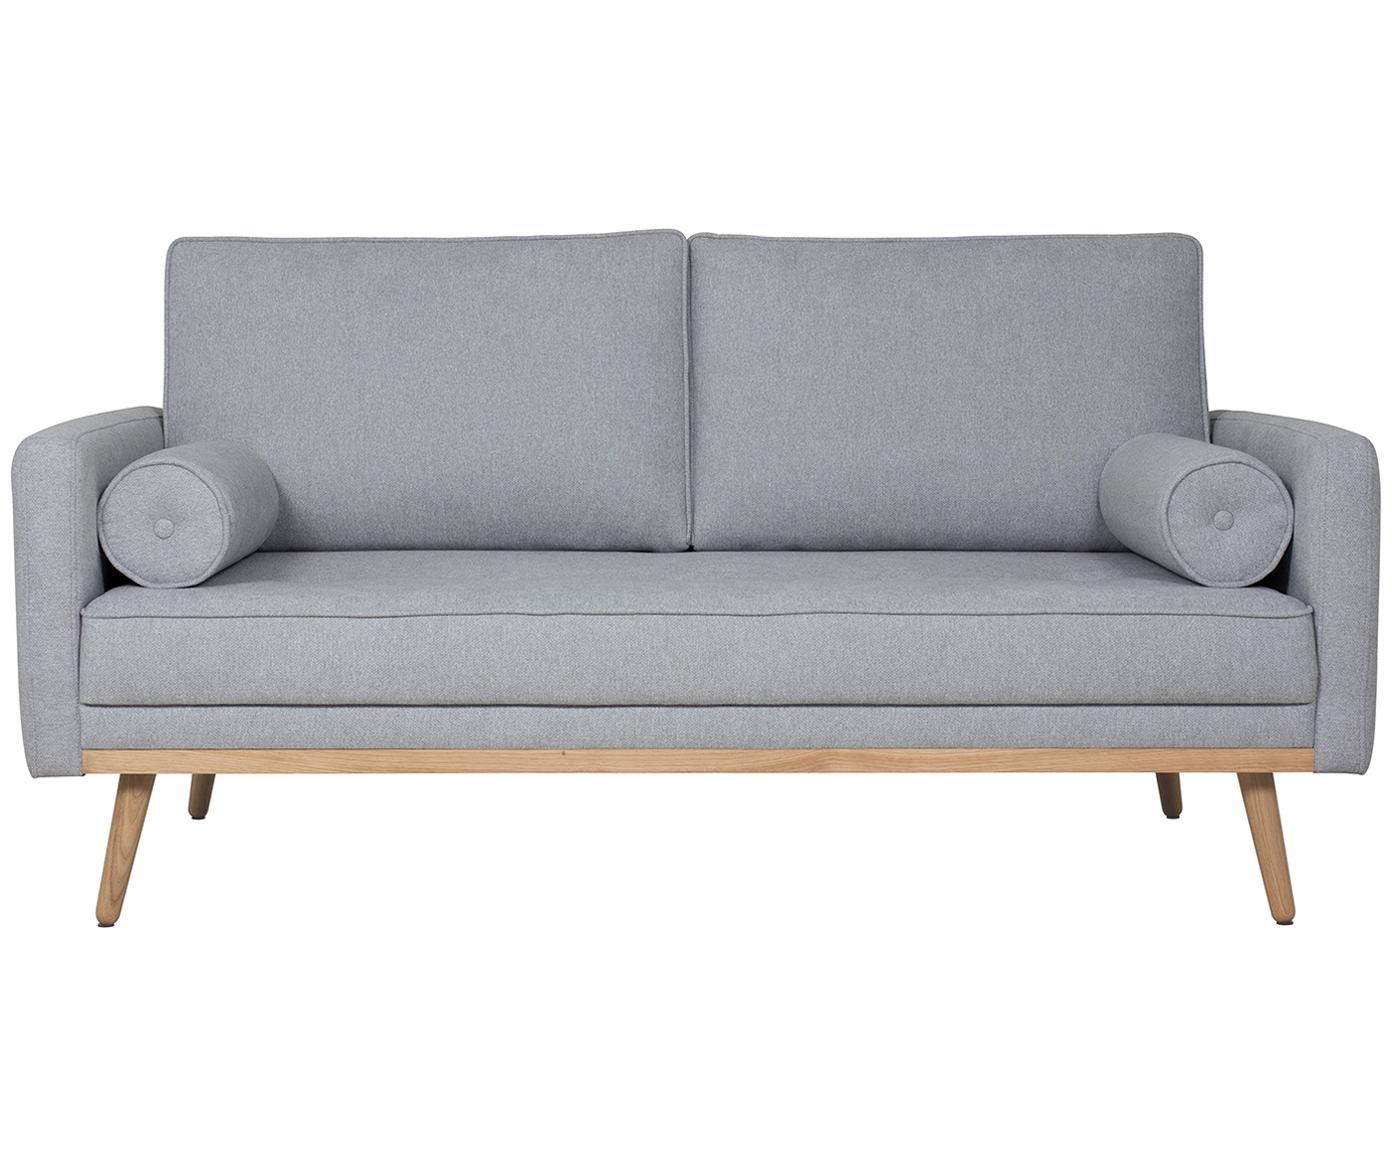 Sofa Saint (2-Sitzer), Bezug: Polyester Der hochwertige, Gestell: Massives Kiefernholz, Spa, Webstoff Blaugrau, B 169 x T 93 cm